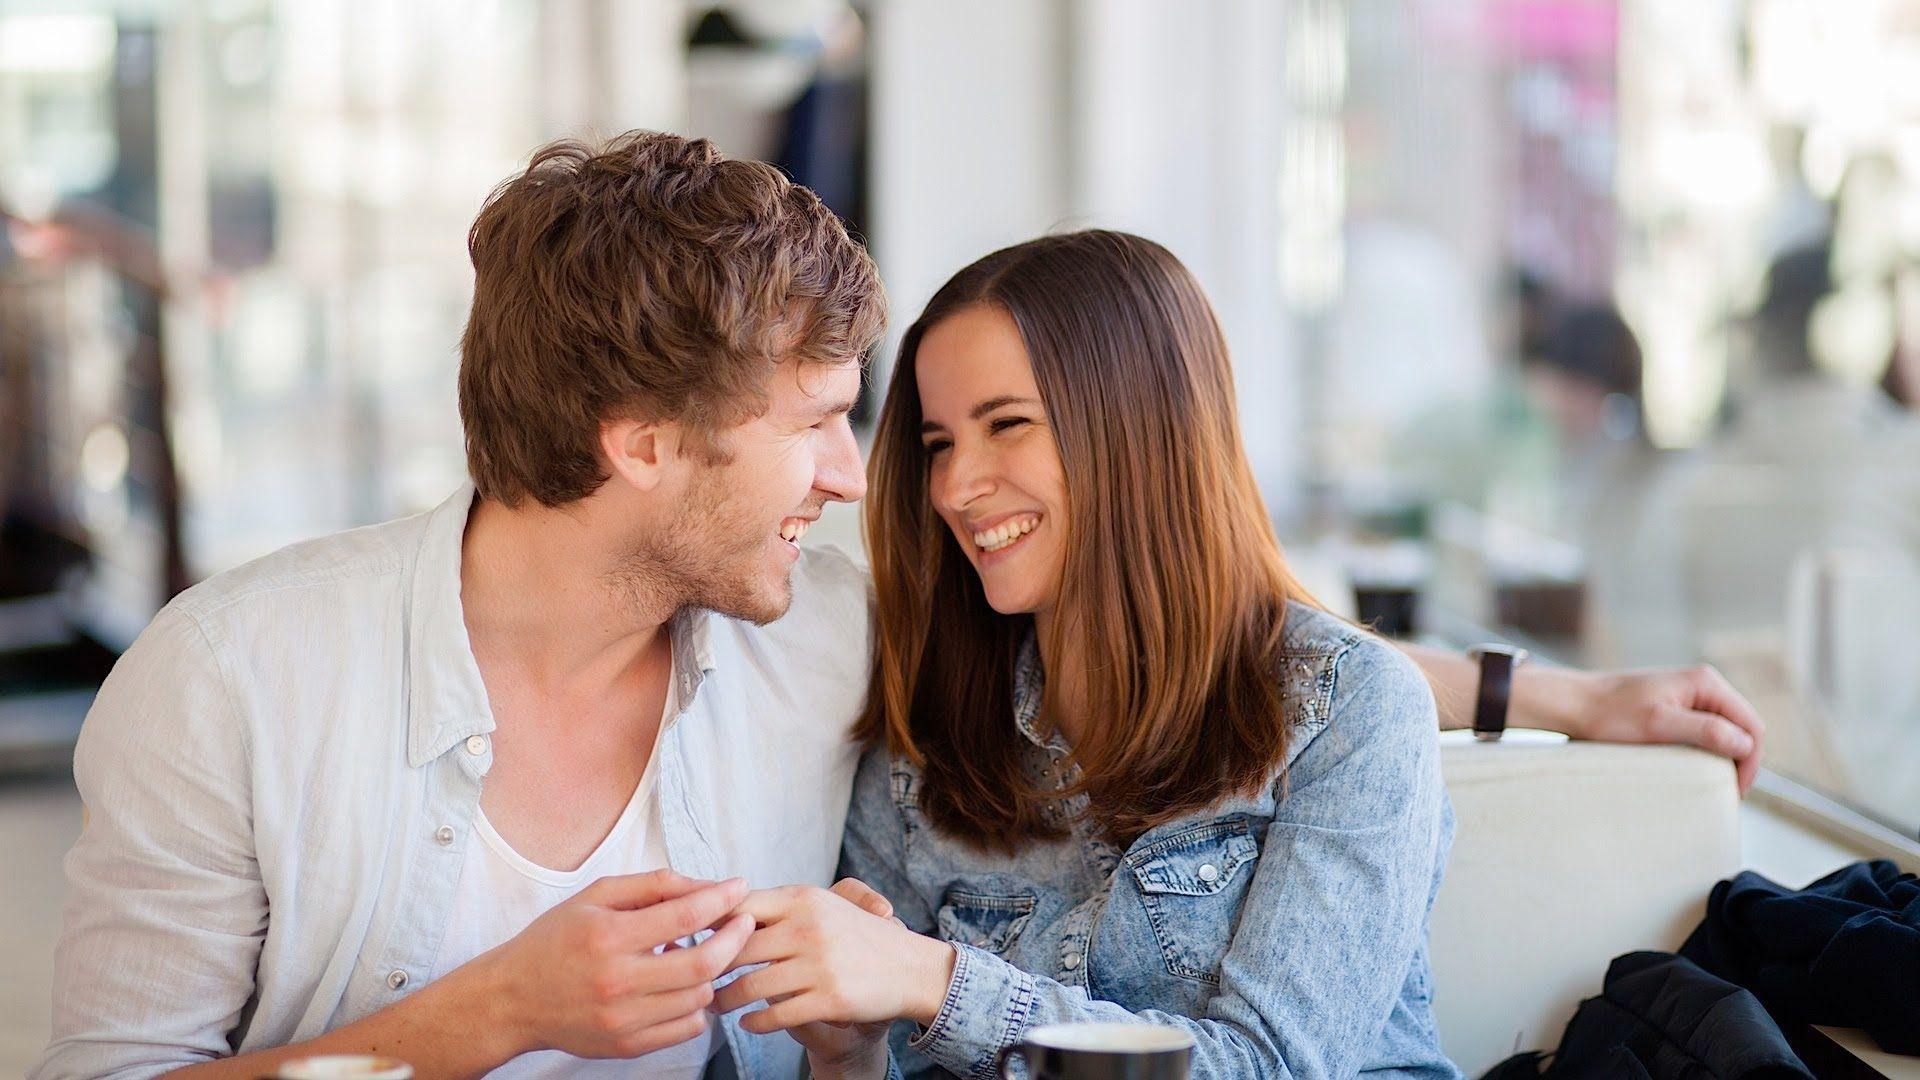 Using body language to flirt